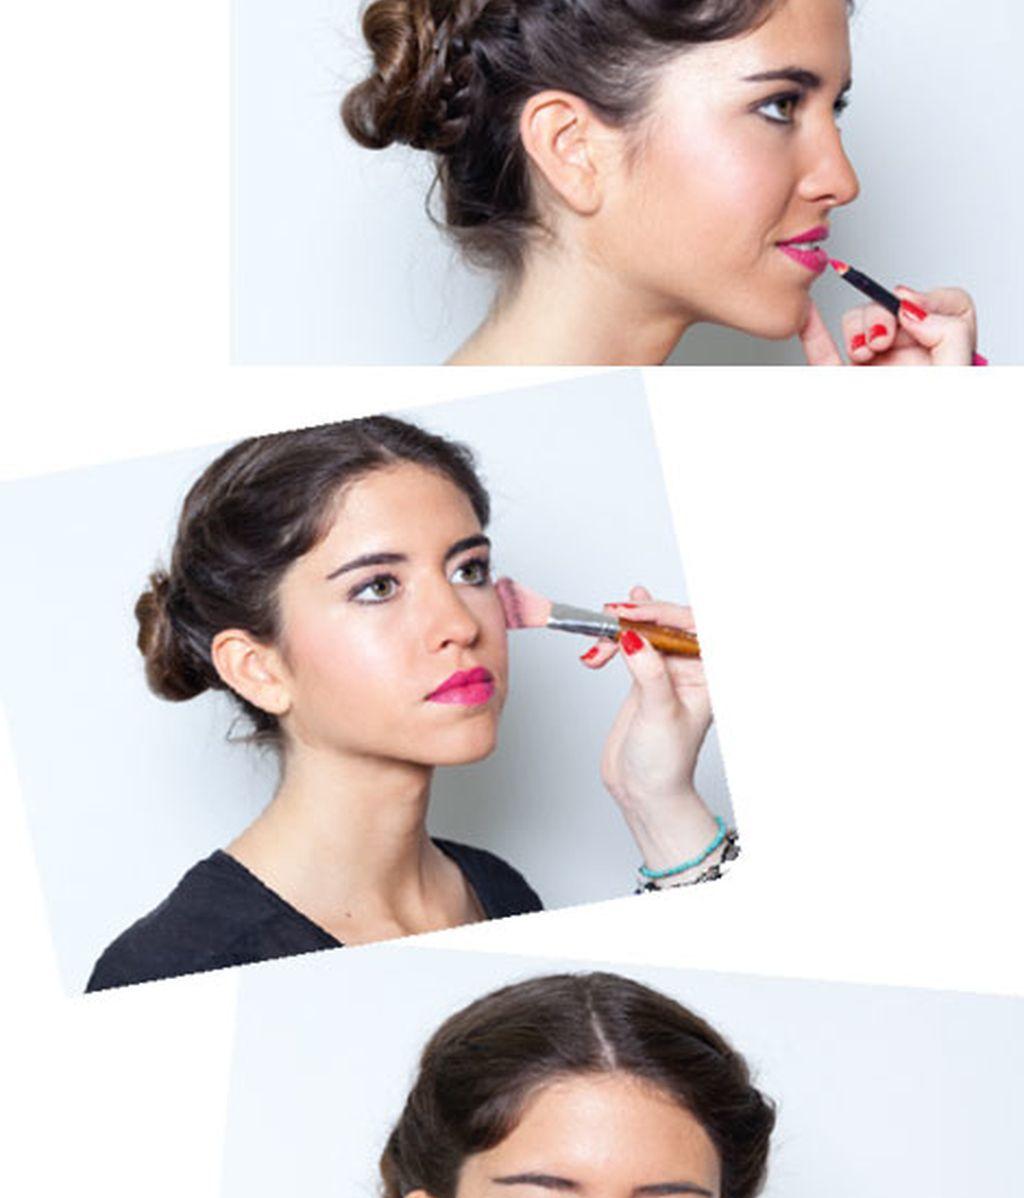 S.O.S. tengo una boda: el maquillaje